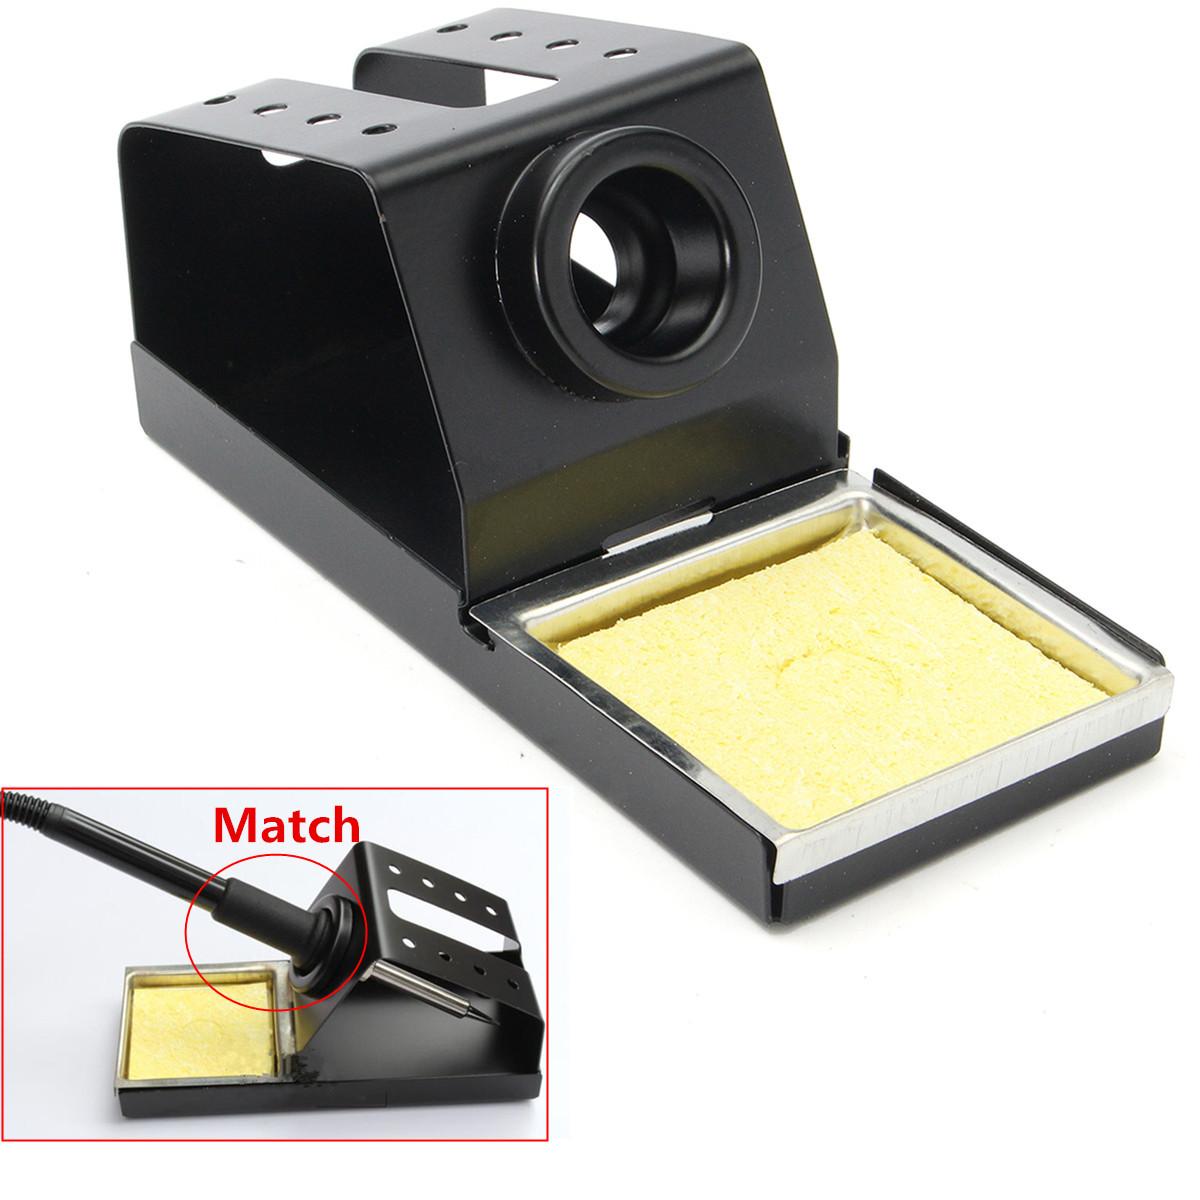 metal material soldering iron stand with sponge for hakko936 soldering station alex nld. Black Bedroom Furniture Sets. Home Design Ideas